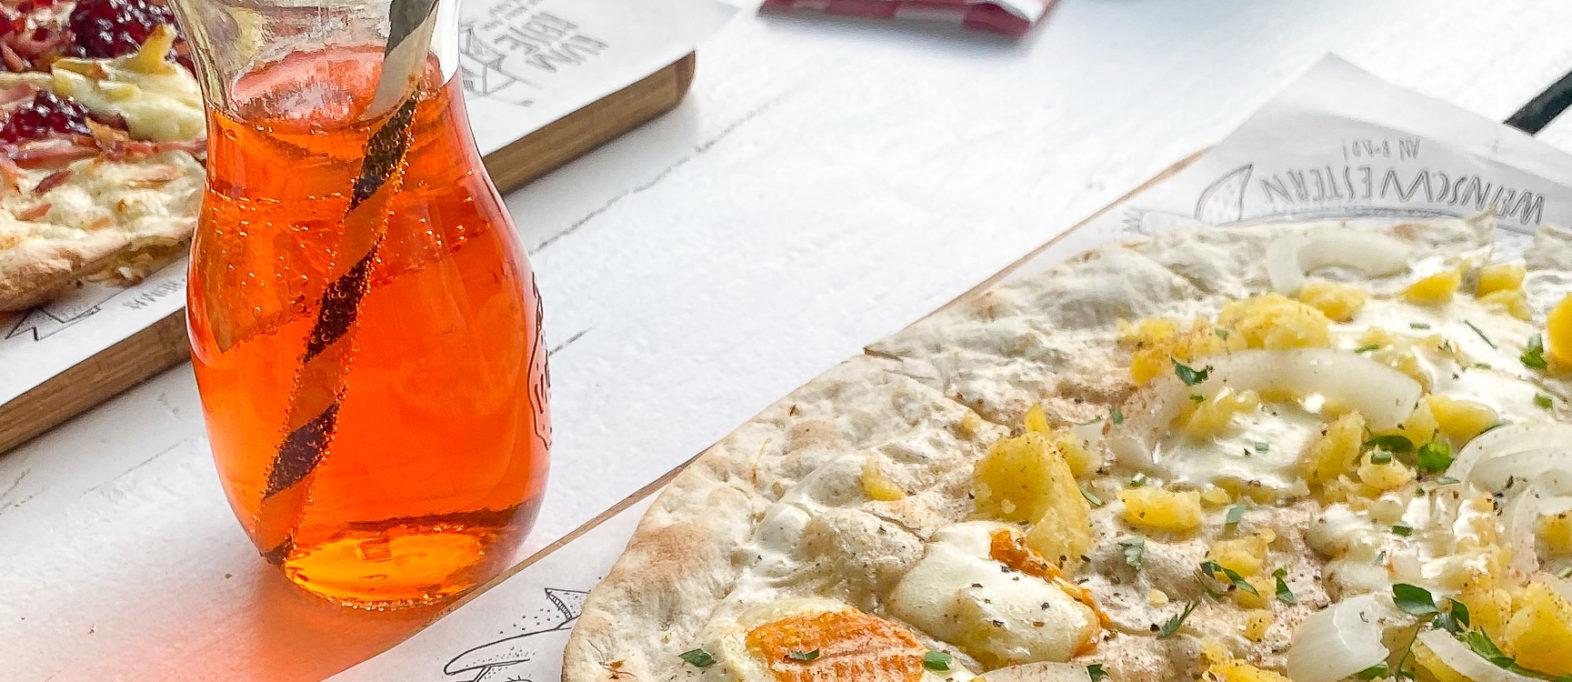 Heilbronn: 11 Tipps, wo du lecker essen gehen kannst